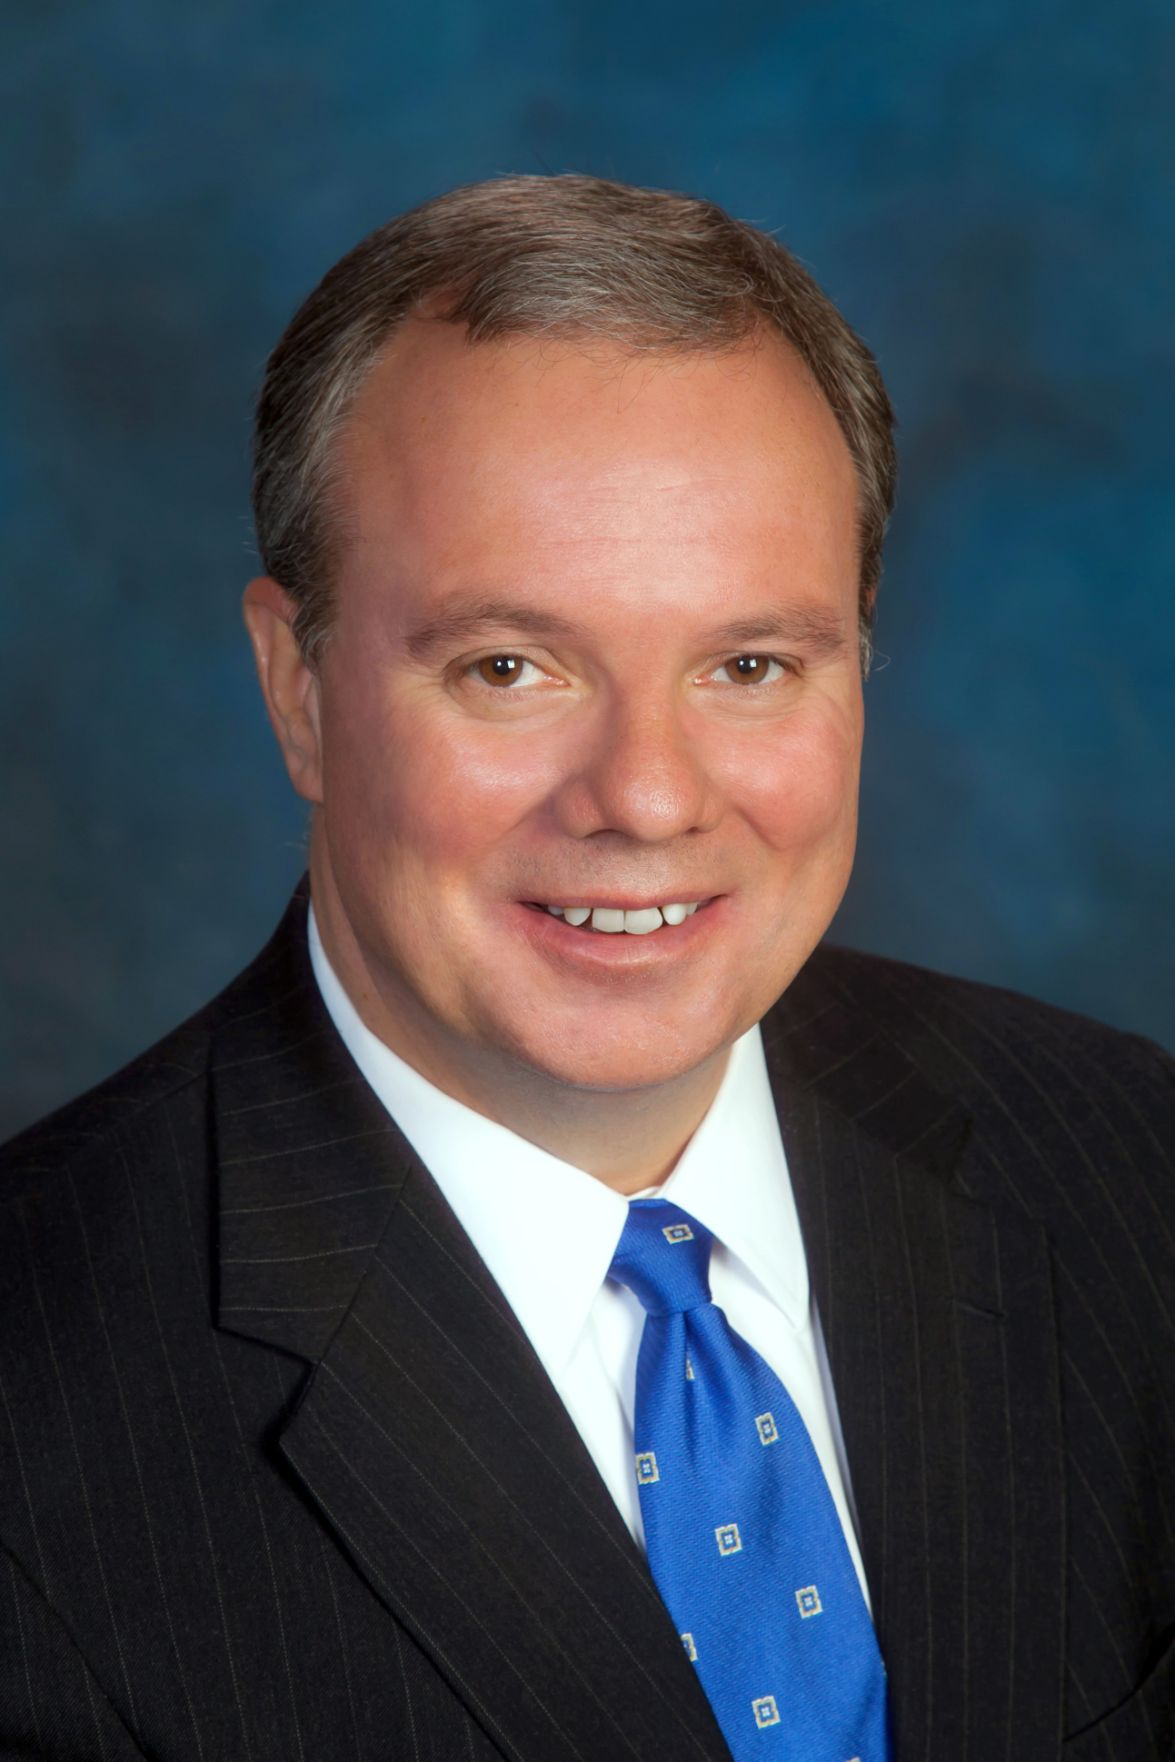 Dr. Jon Bauer, ECC President